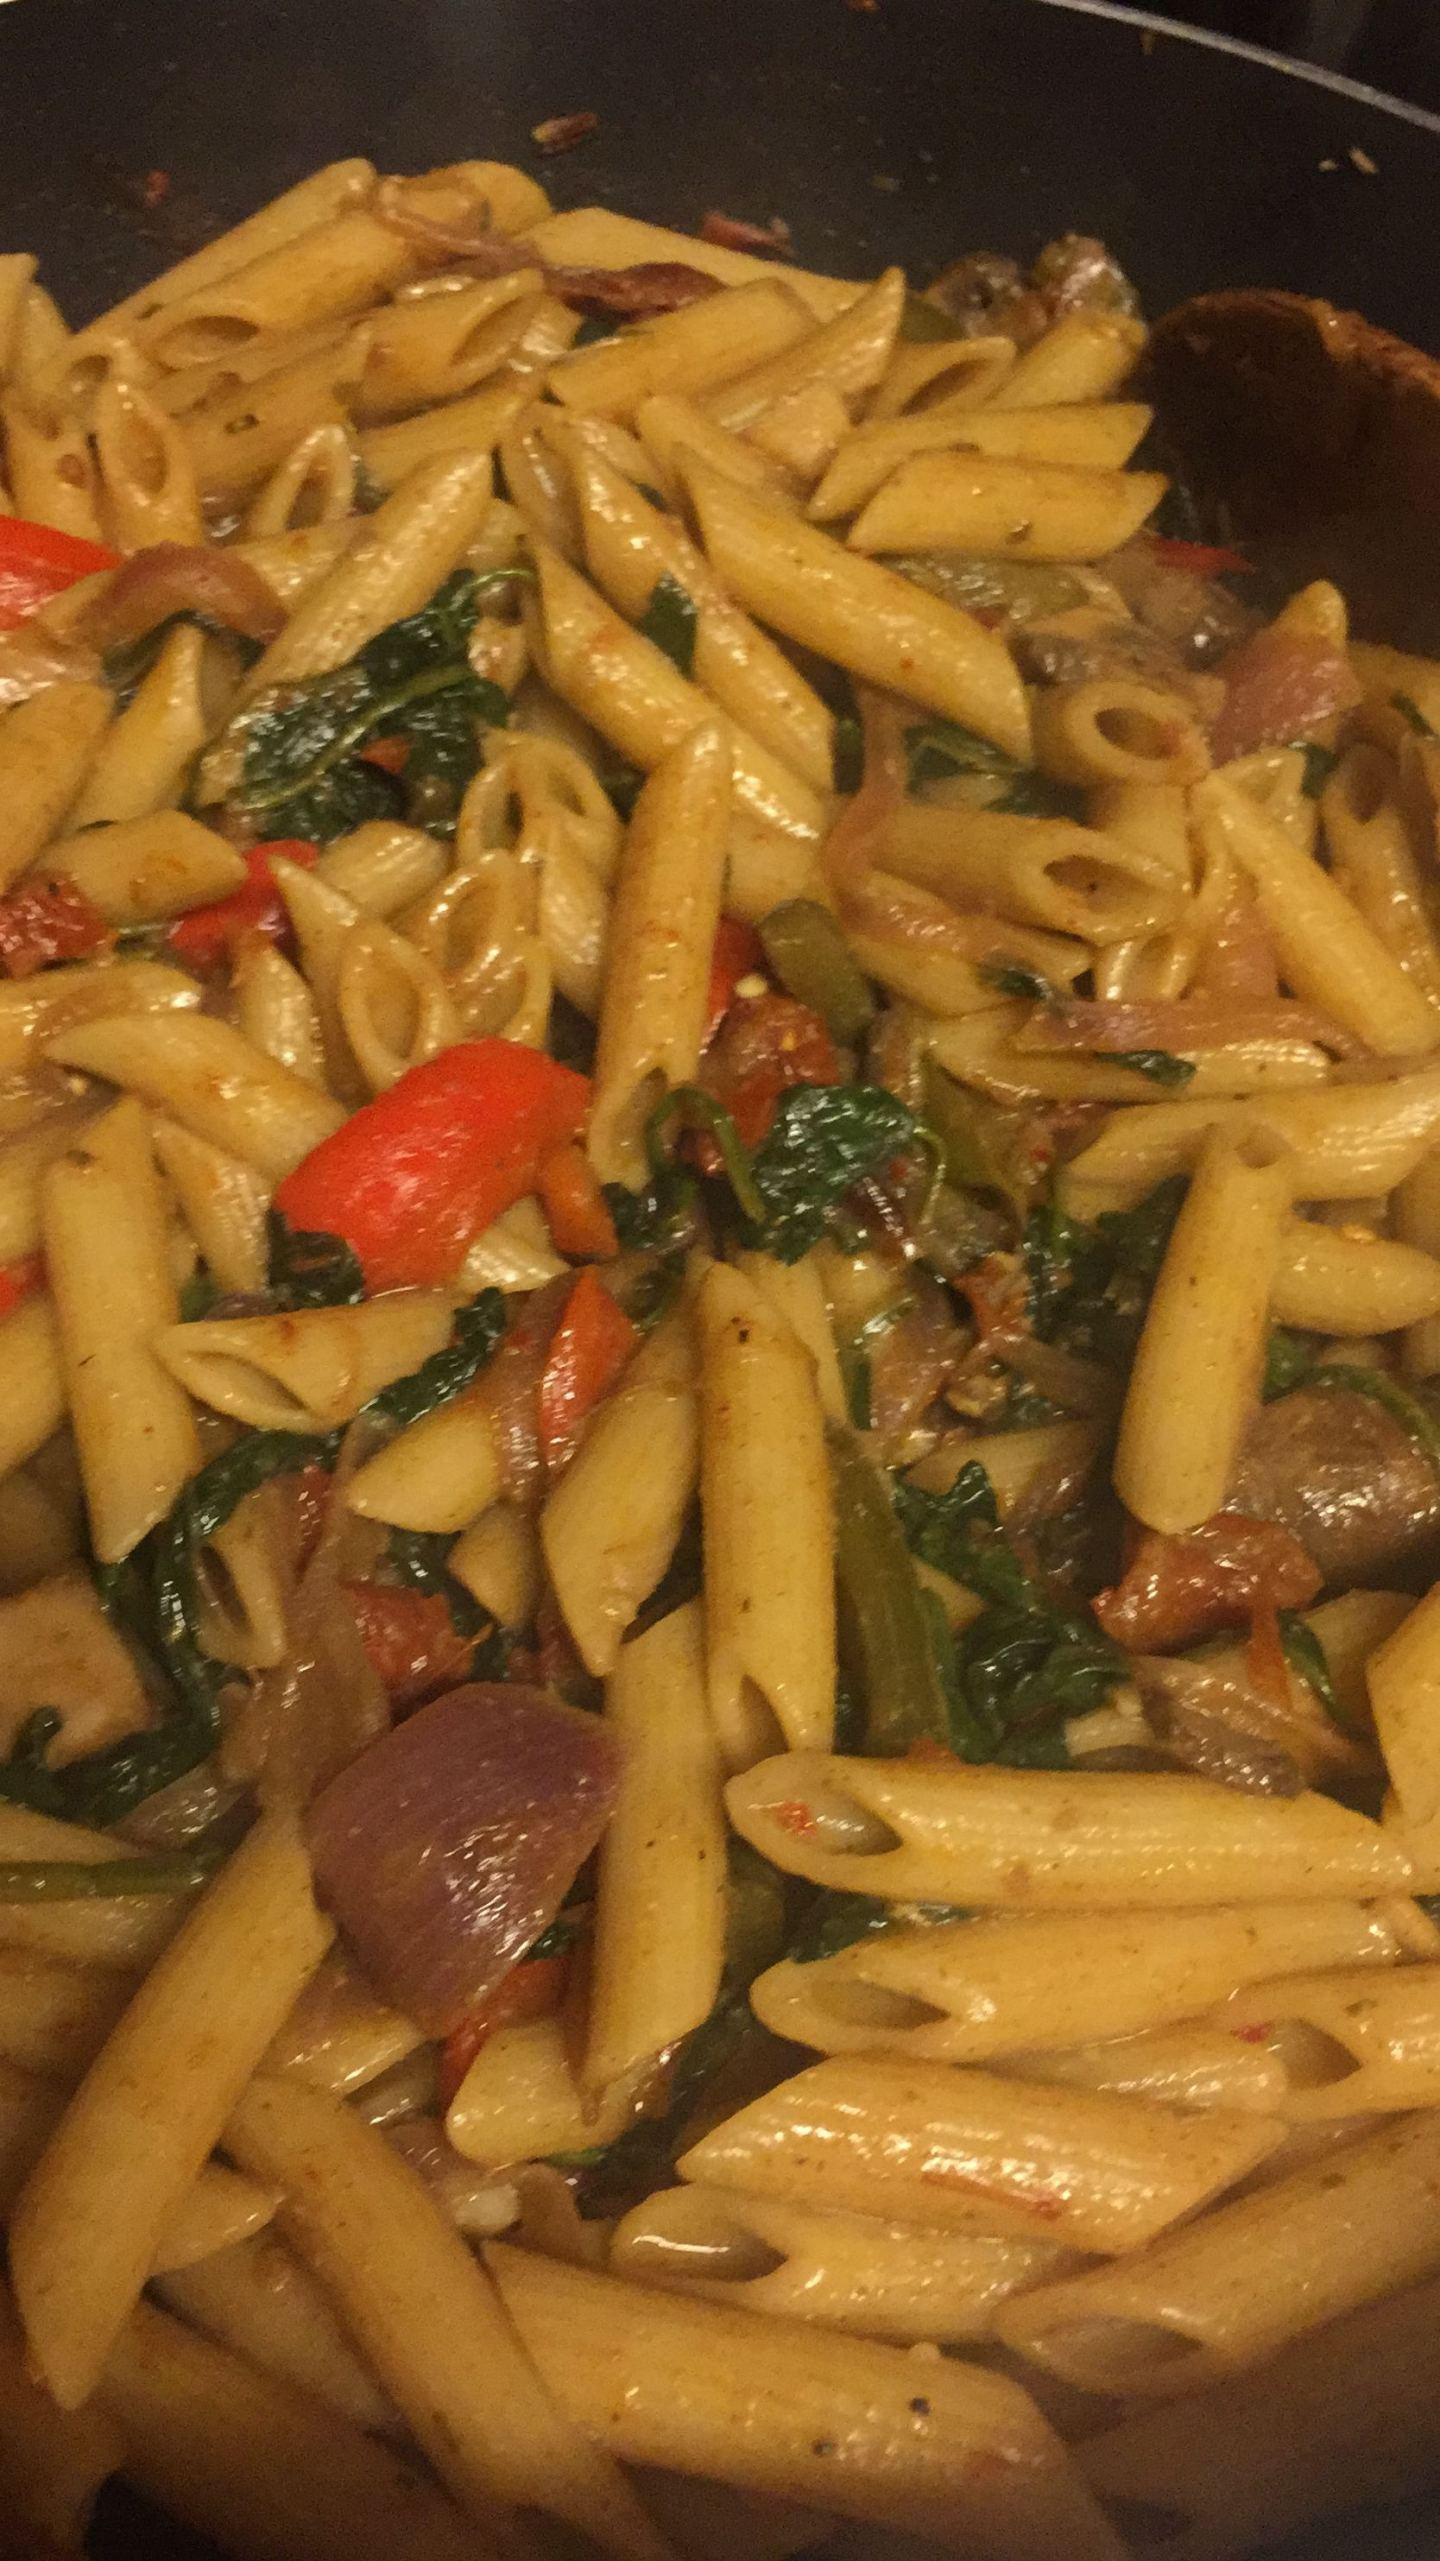 vegan jerk pasta - How Going Vegan Changed My Life - YesIMadeMyDress